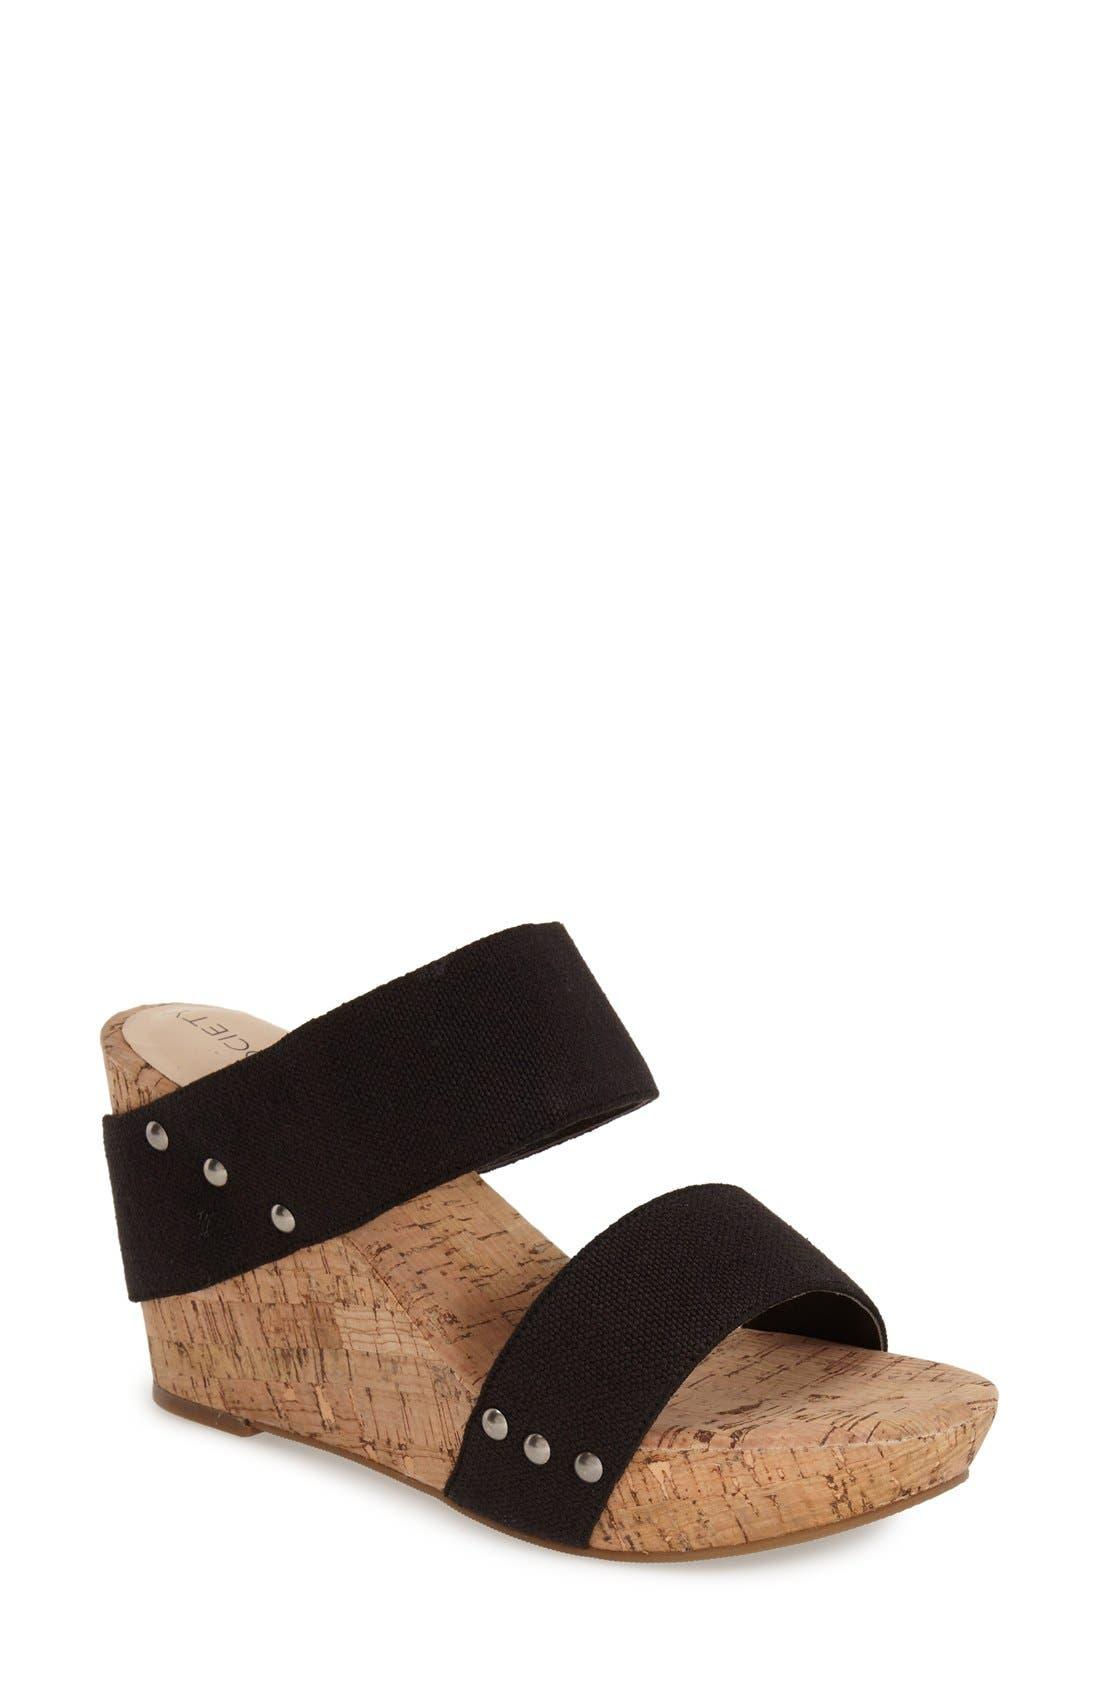 'Emilia 2' Wedge Sandal,                         Main,                         color, Black